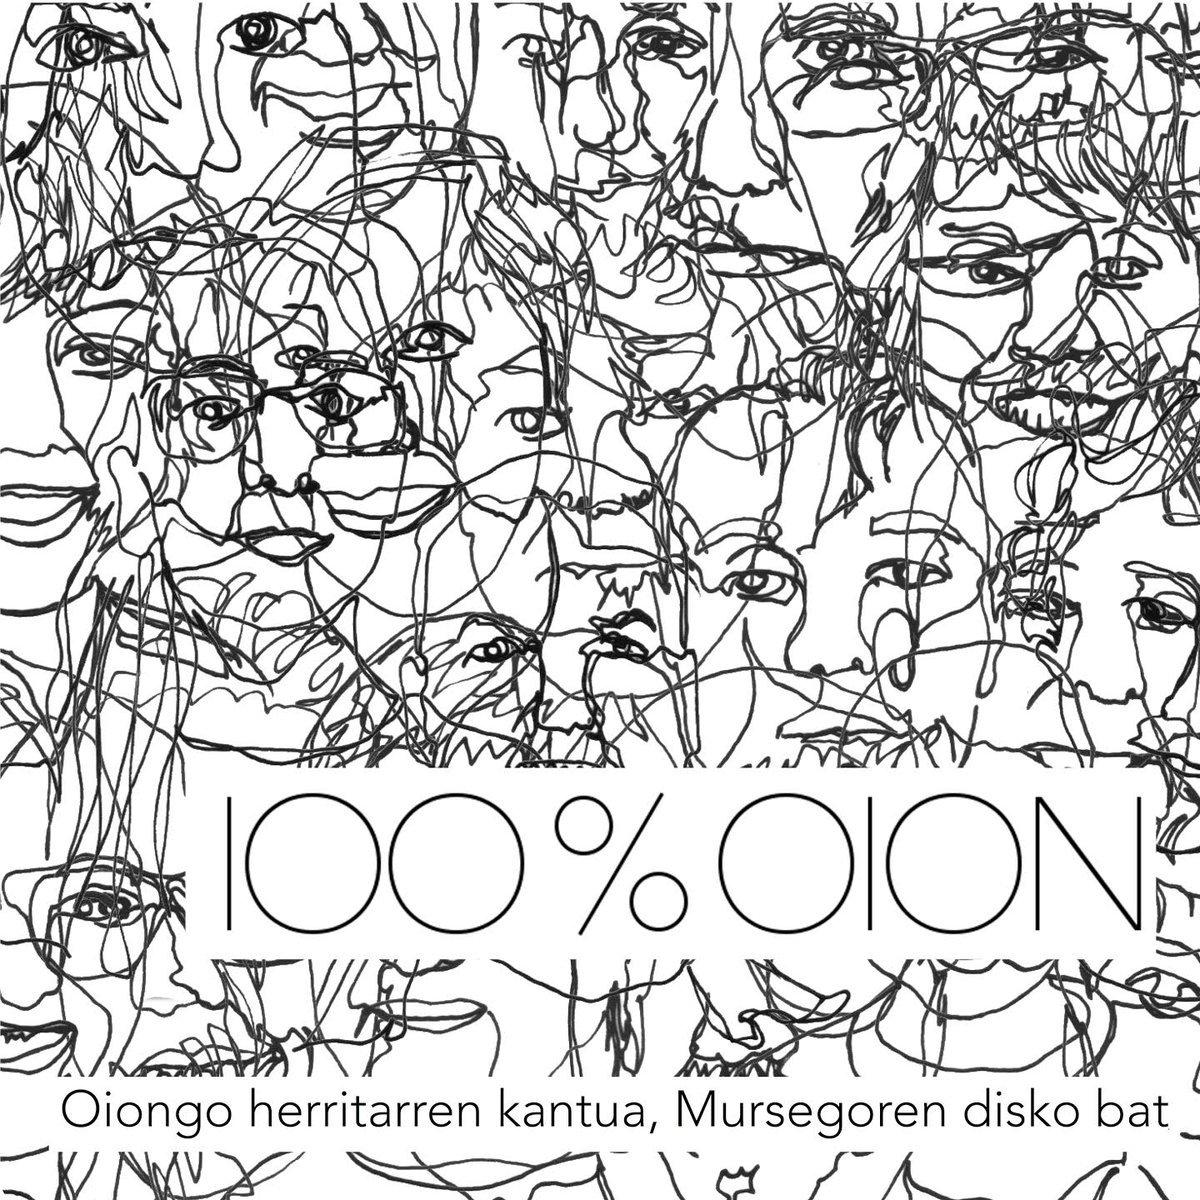 """100% Oion"", Mursegoren lan berriaren kritika idatzi du @anttoniturbe-k. https://t.co/RclSpJ32wG https://t.co/xEA9wadj0d"